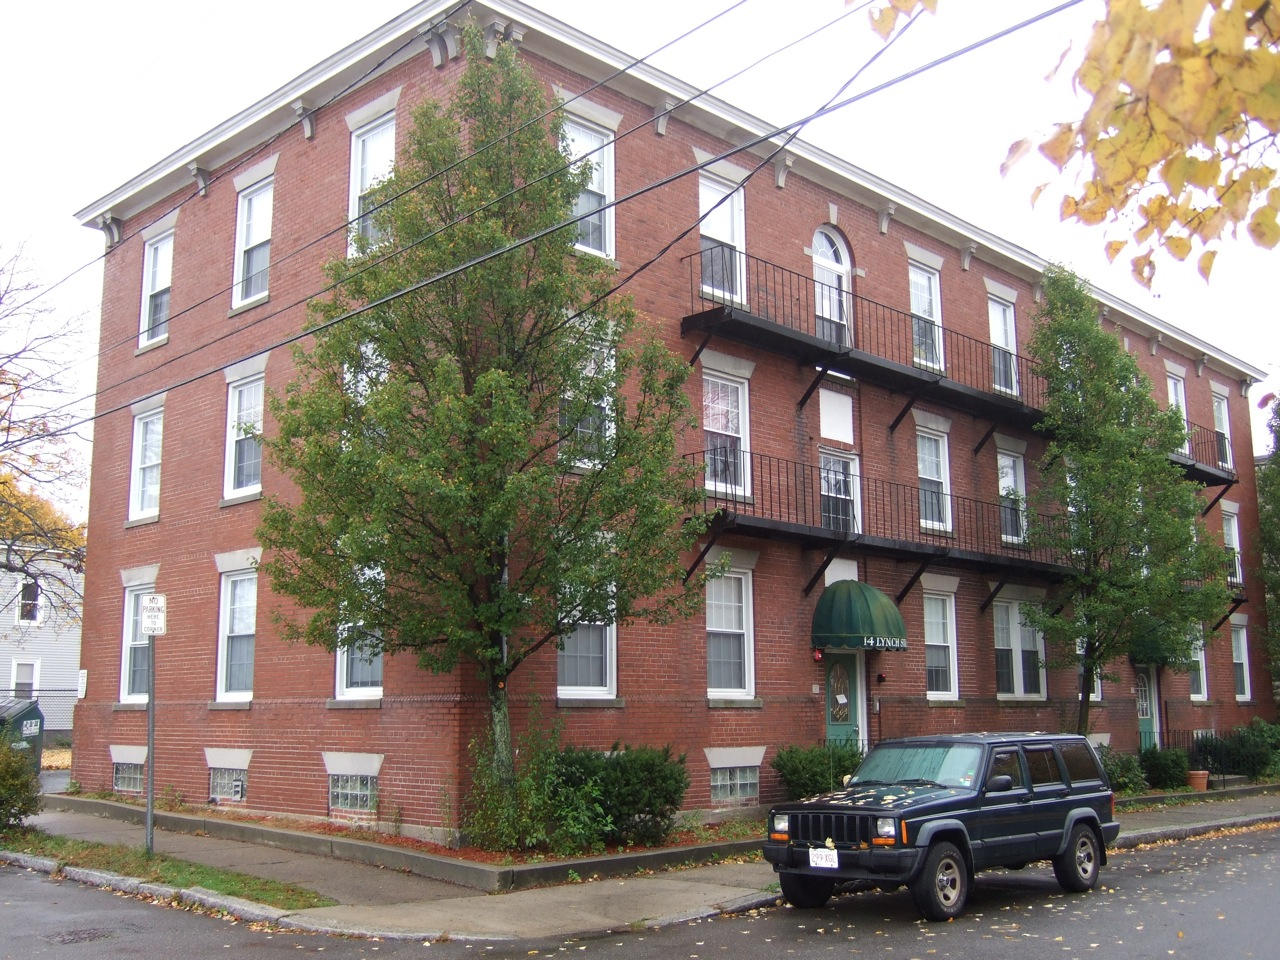 Salem, MA - Apartment Building